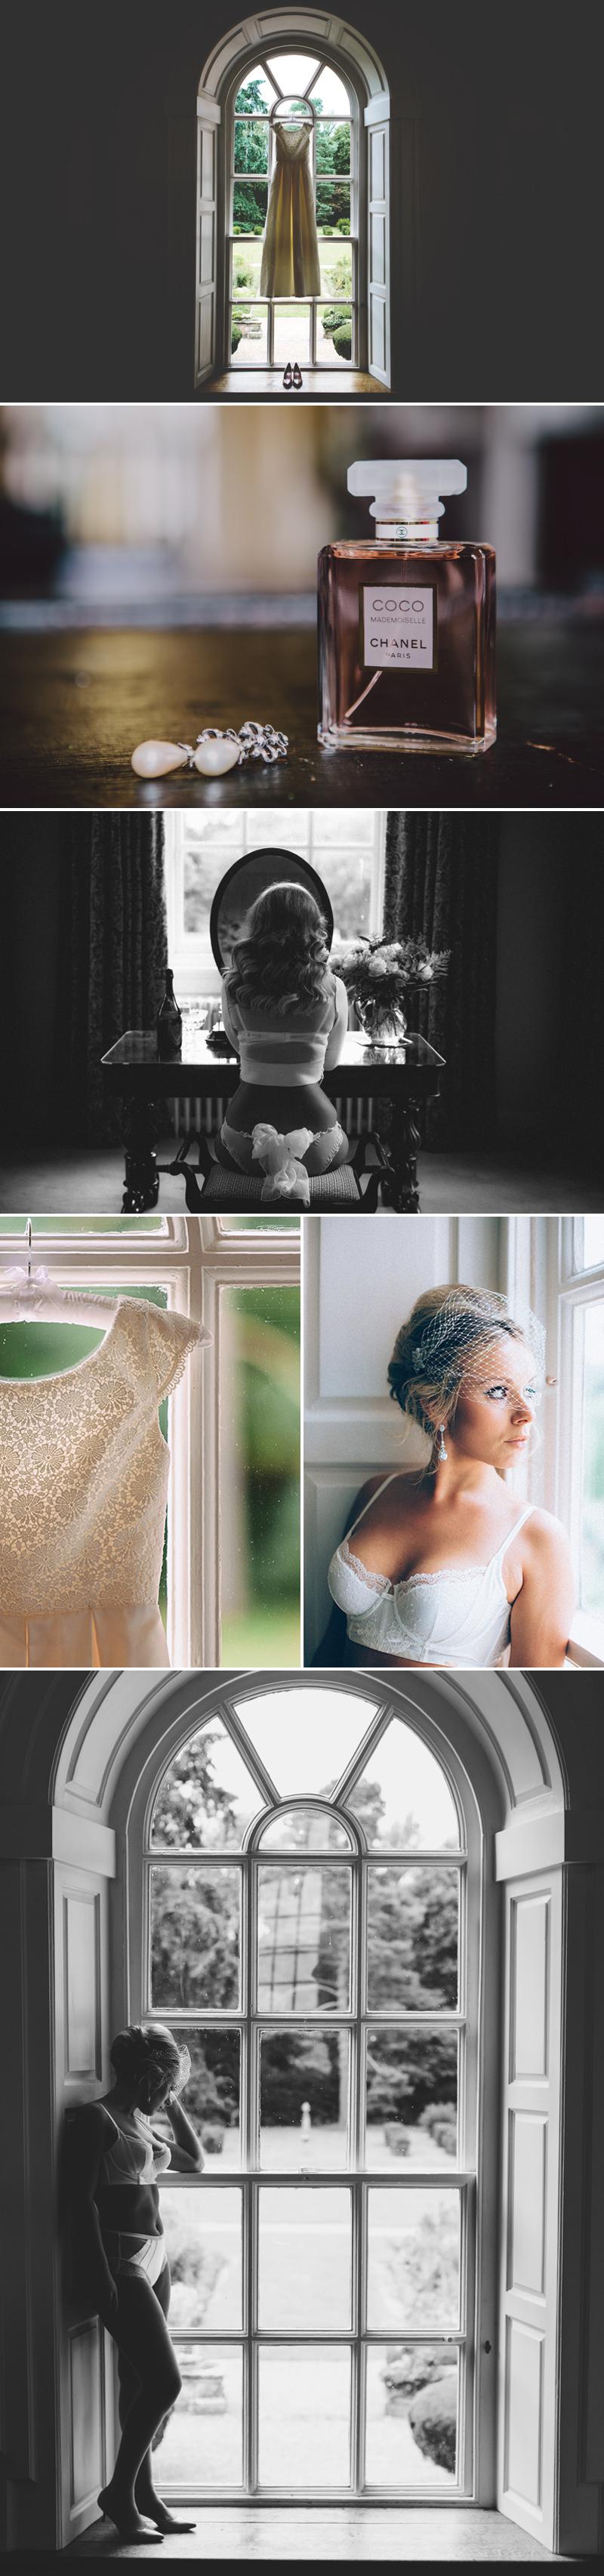 modern-vintage-bridal-boudoir-shoot-iscoyd-park-la-jolie-mariee-coco-wedding-venues-katrina-otter-weddings-004